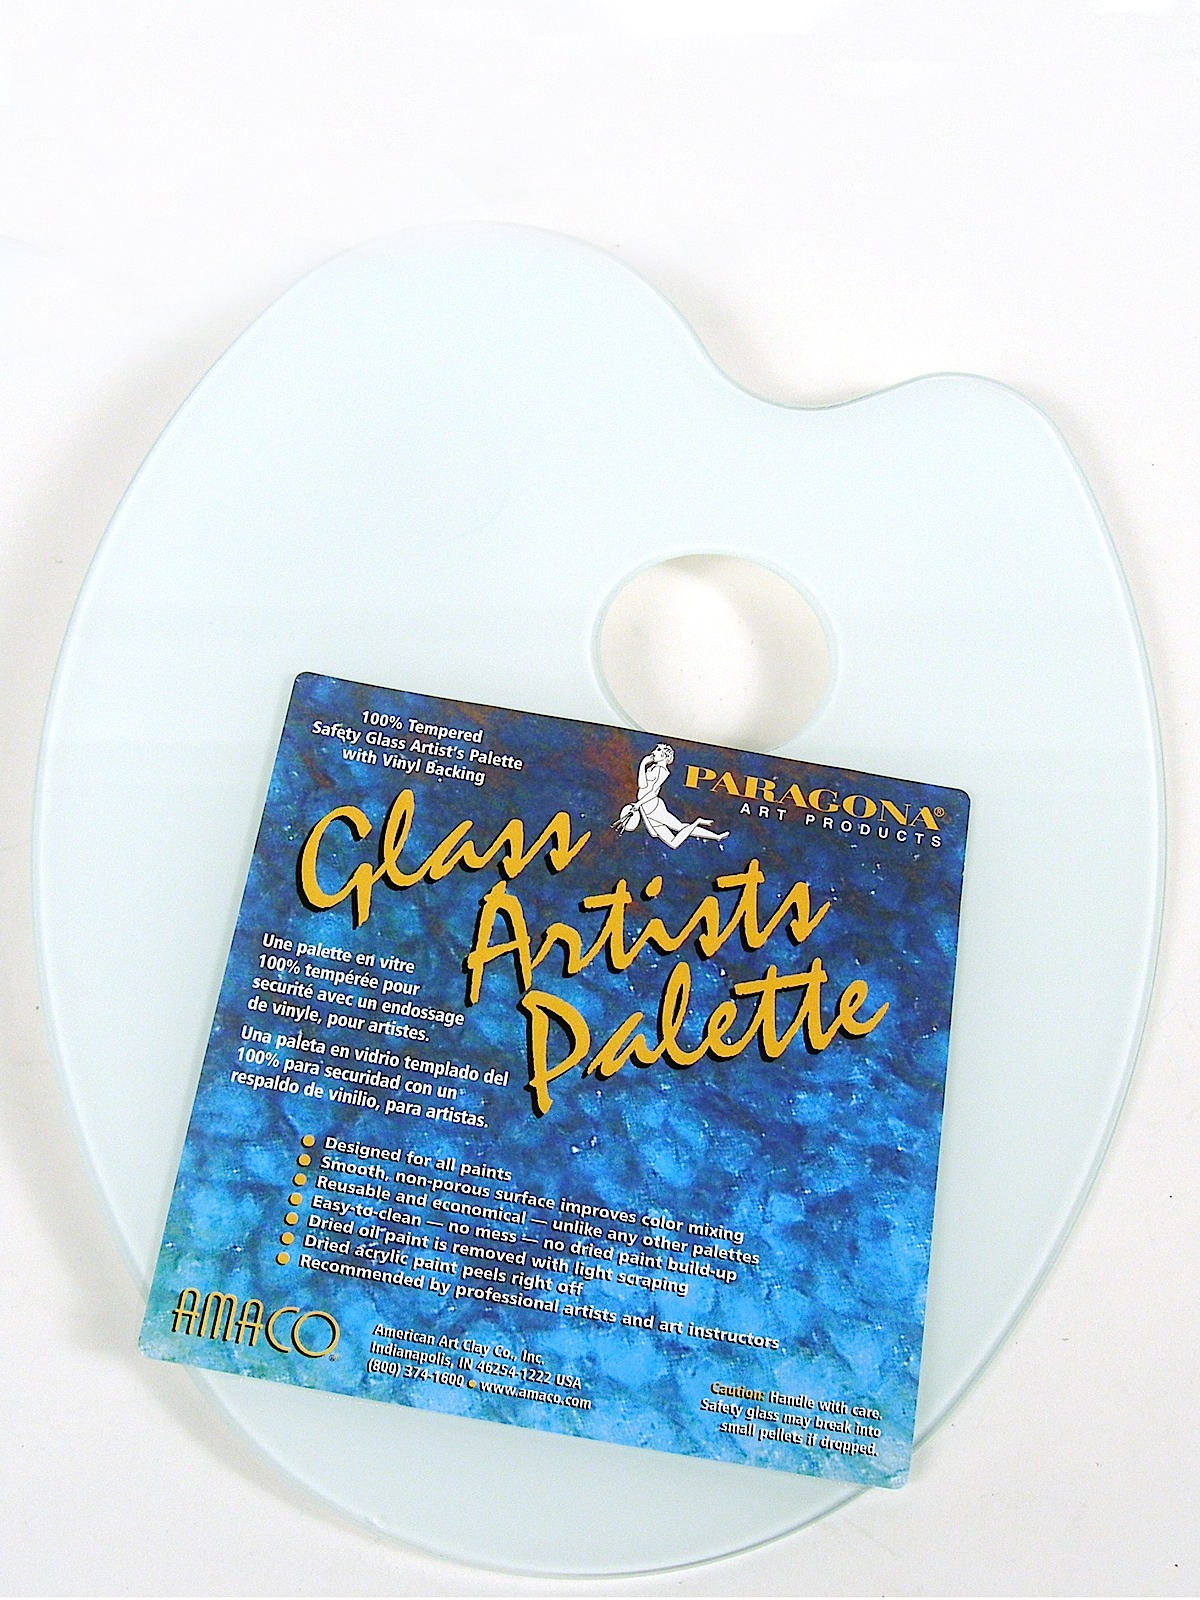 Amaco - Glass Artists Palette